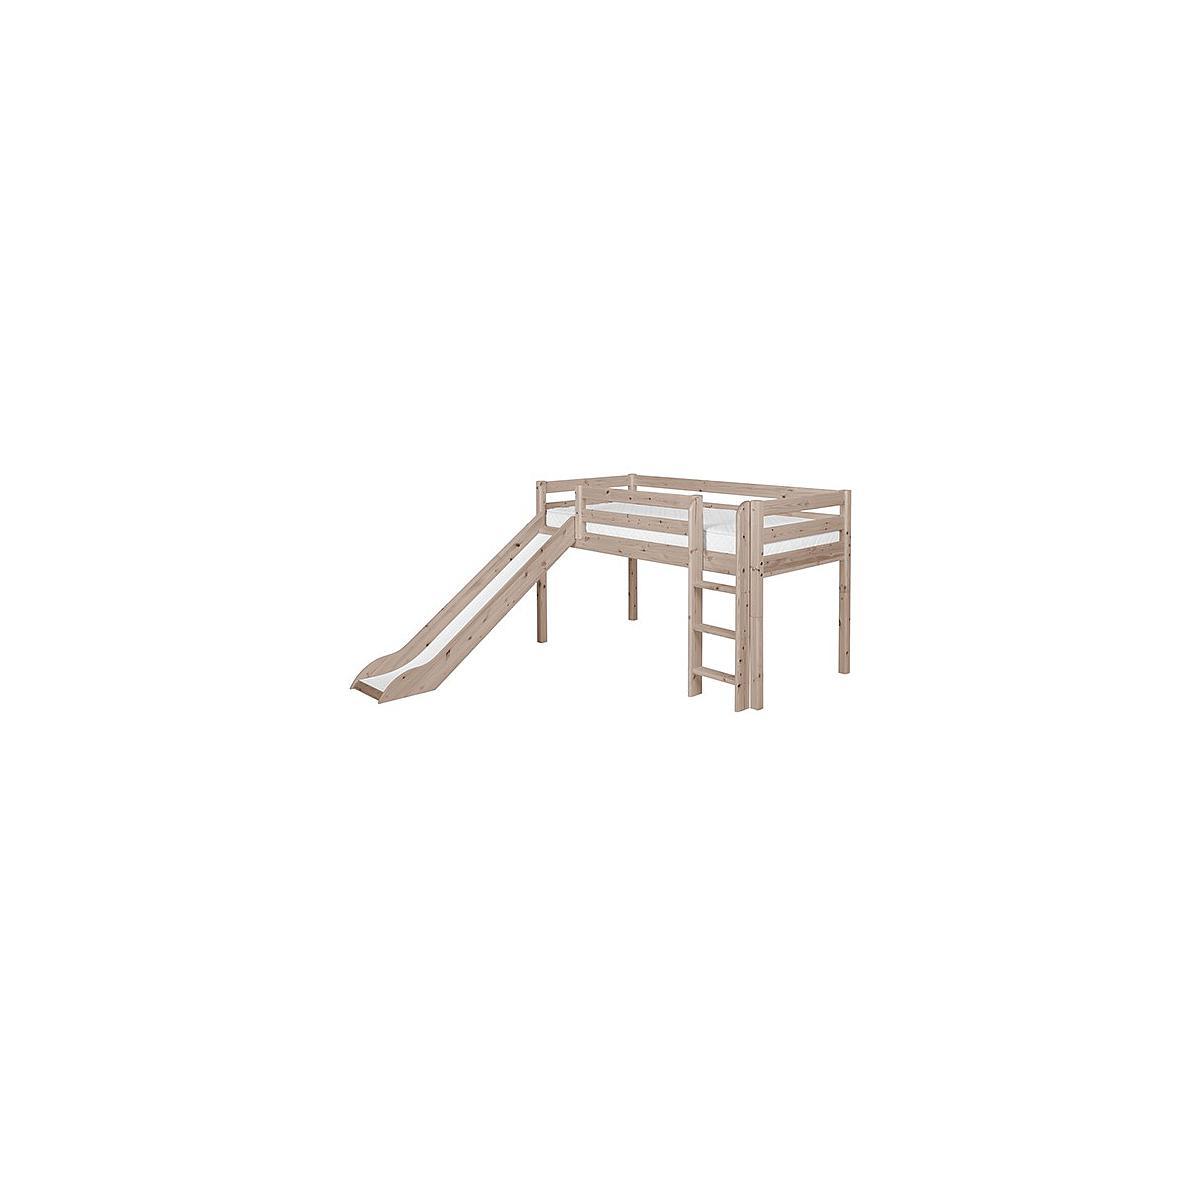 Cama media alta 90x190 CLASSIC Flexa escalera recta tobogán terra